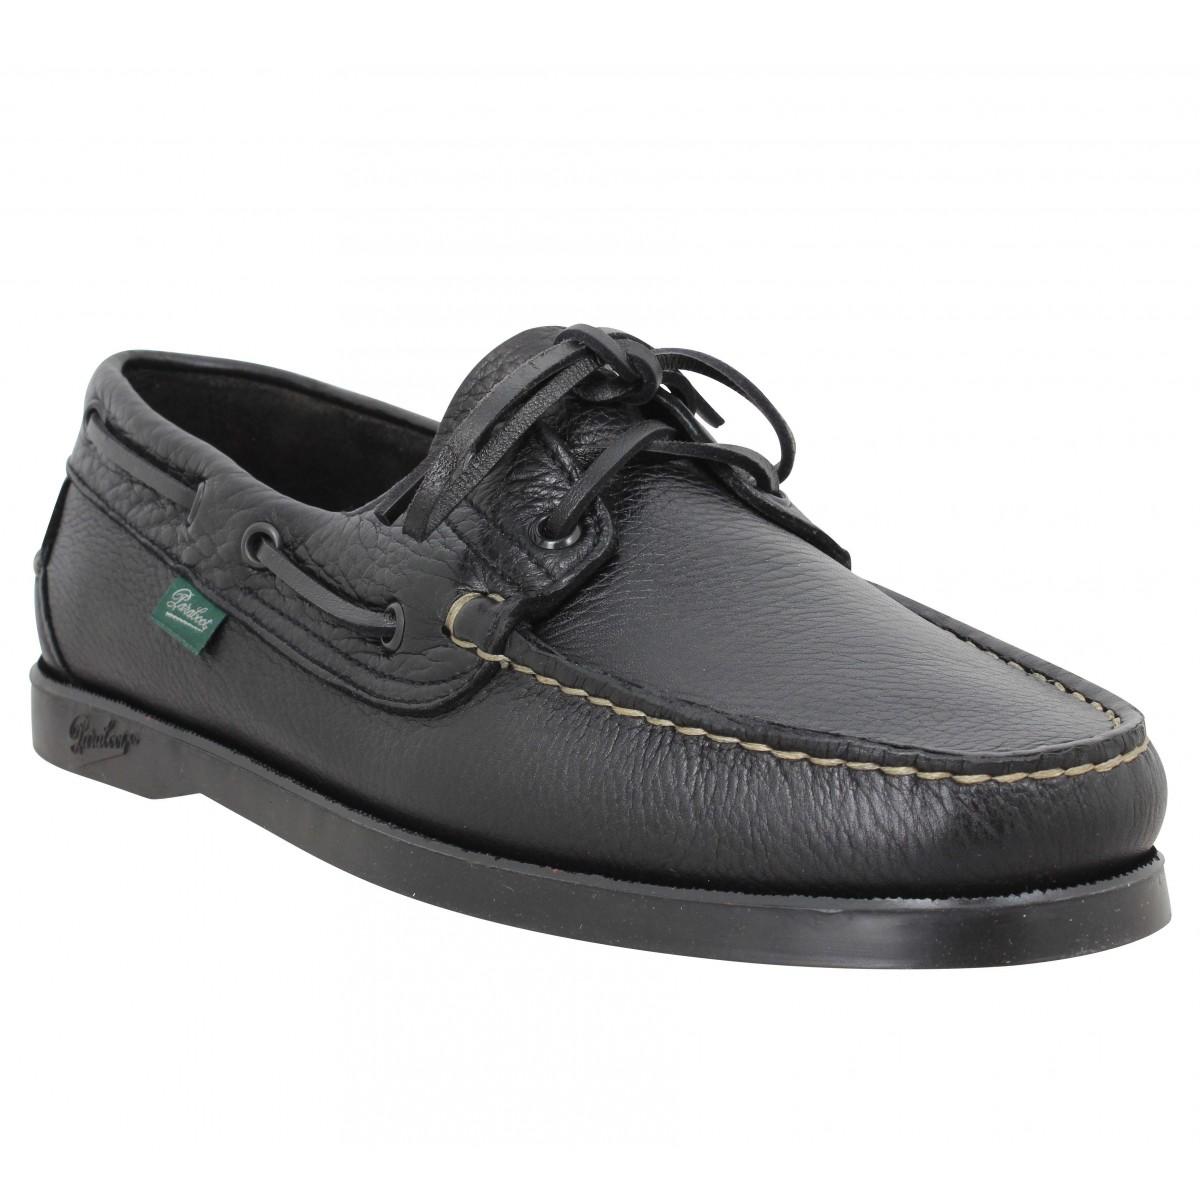 Chaussures bateaux PARABOOT Barth cuir foulonne Homme Noir